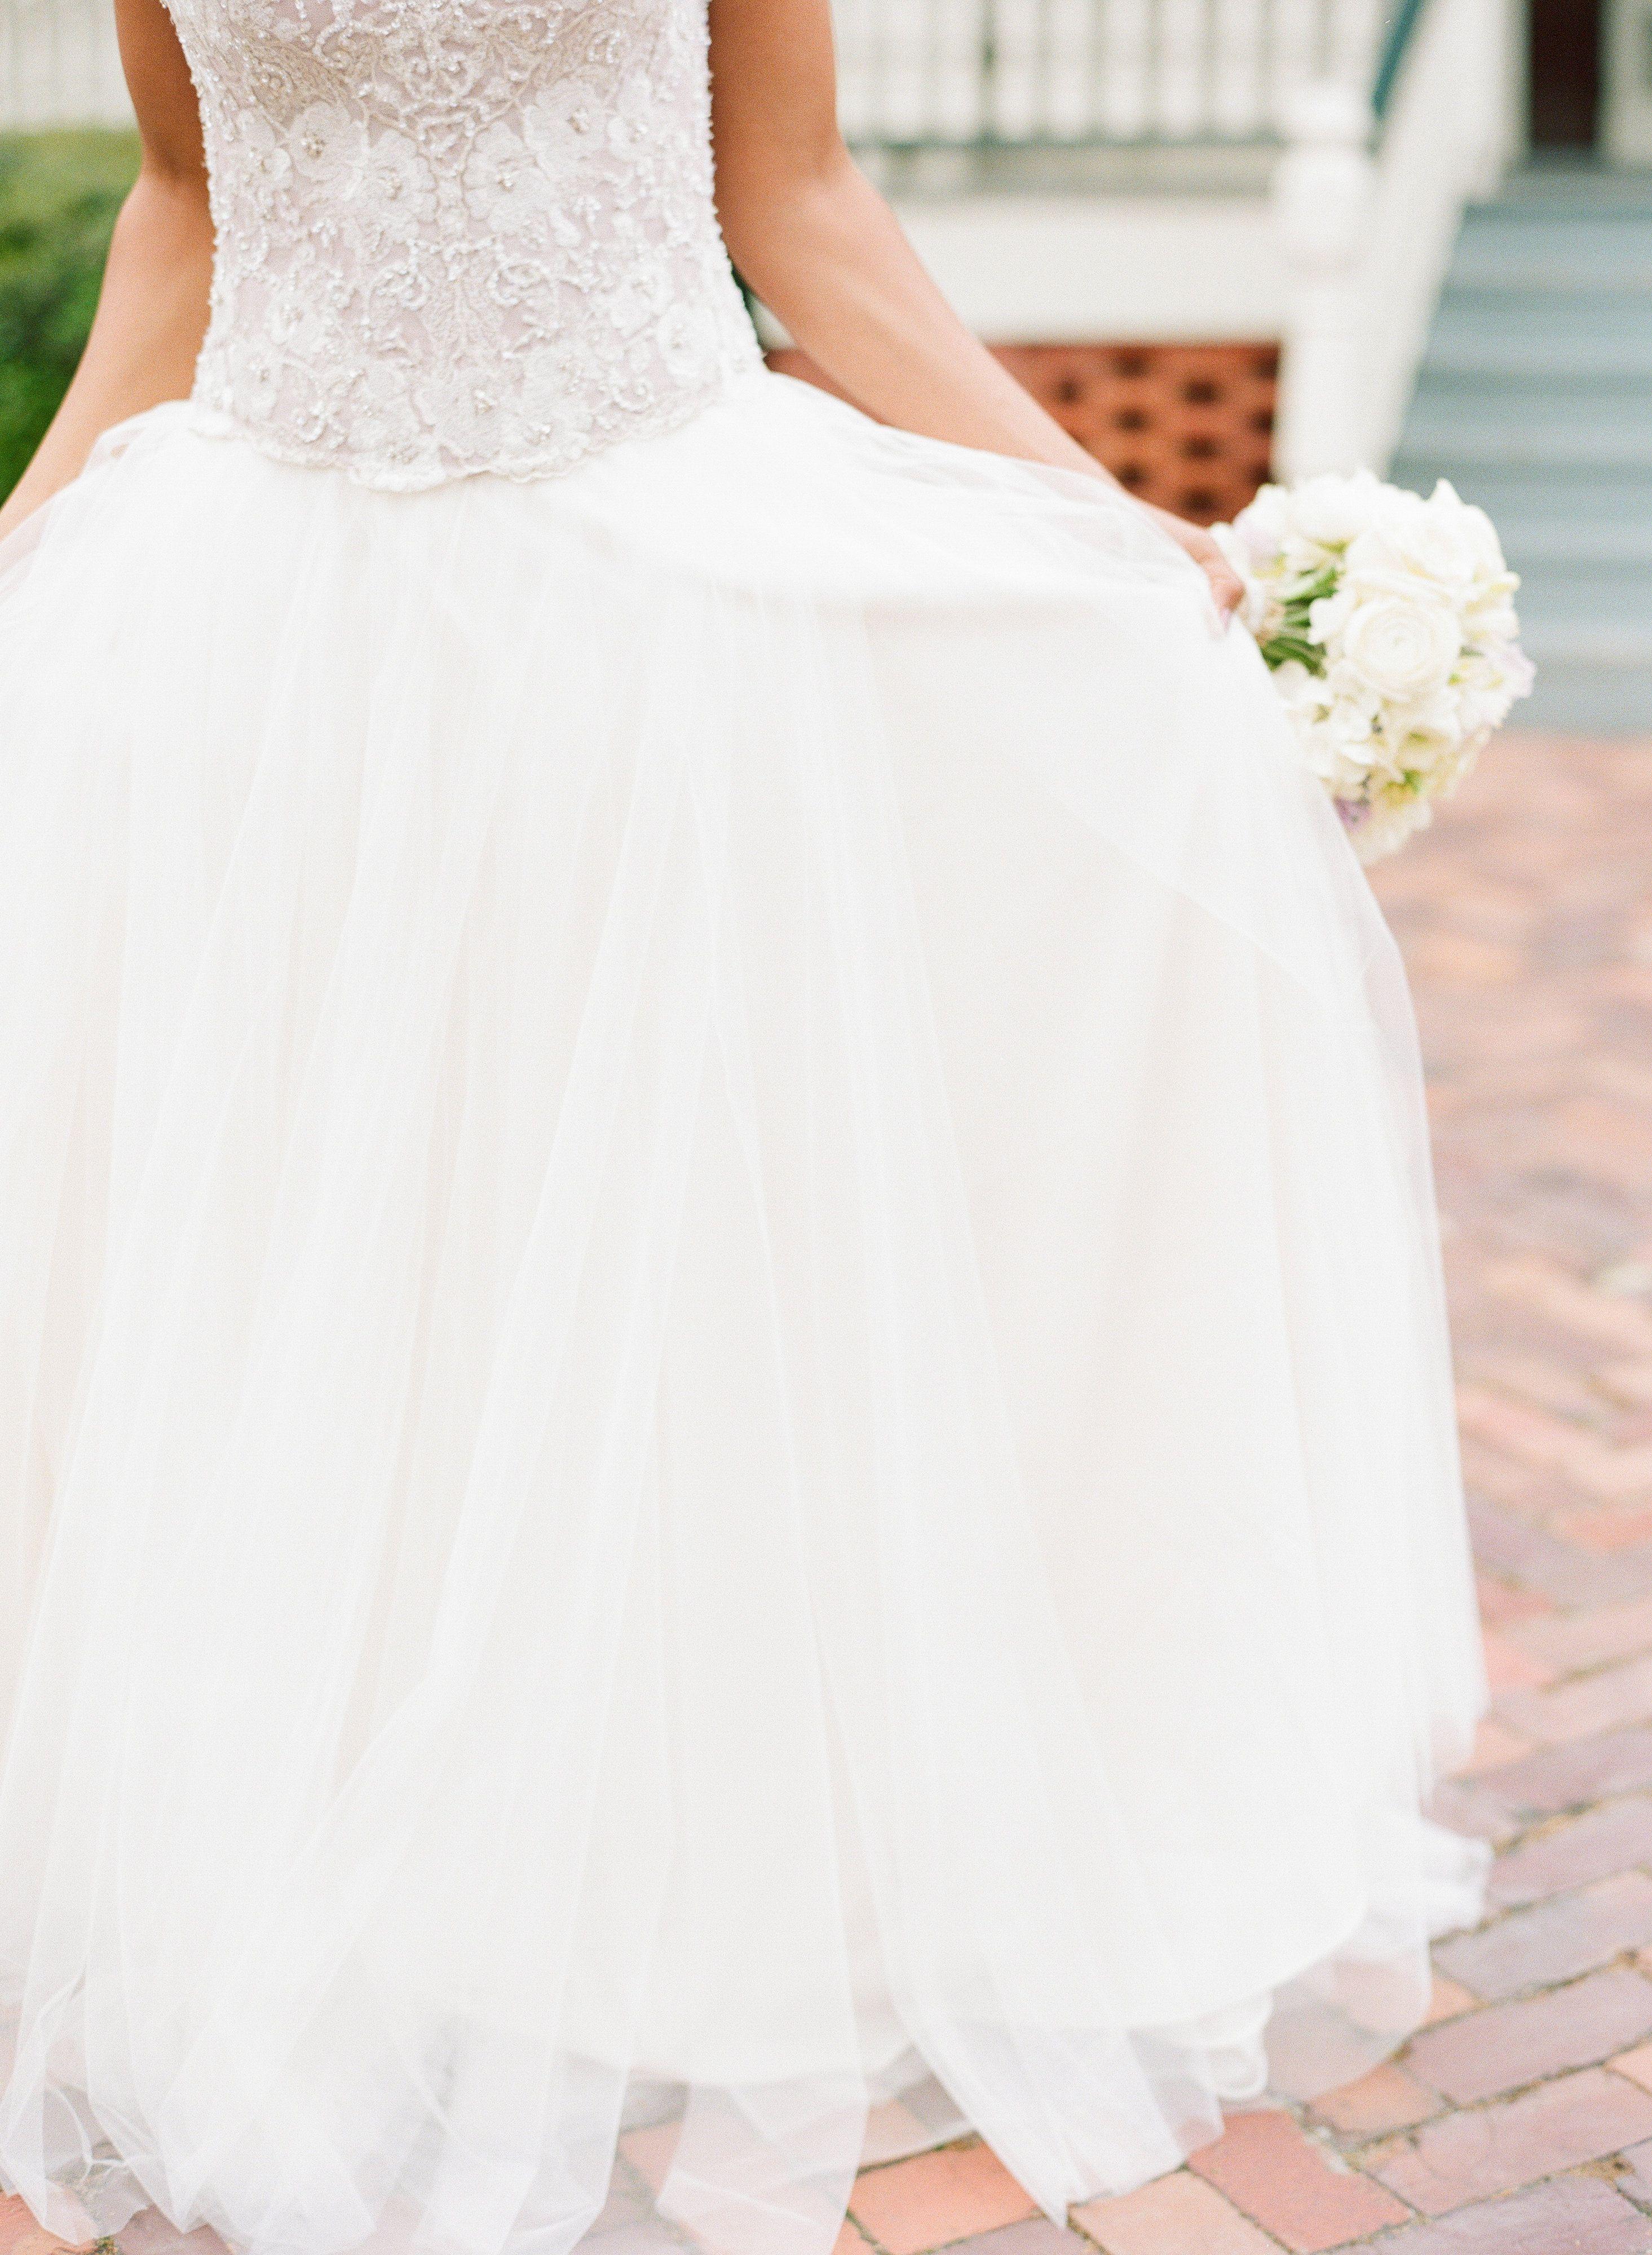 Wedding Dresses Styling Blush Bridal Wtoo Maelin Corset